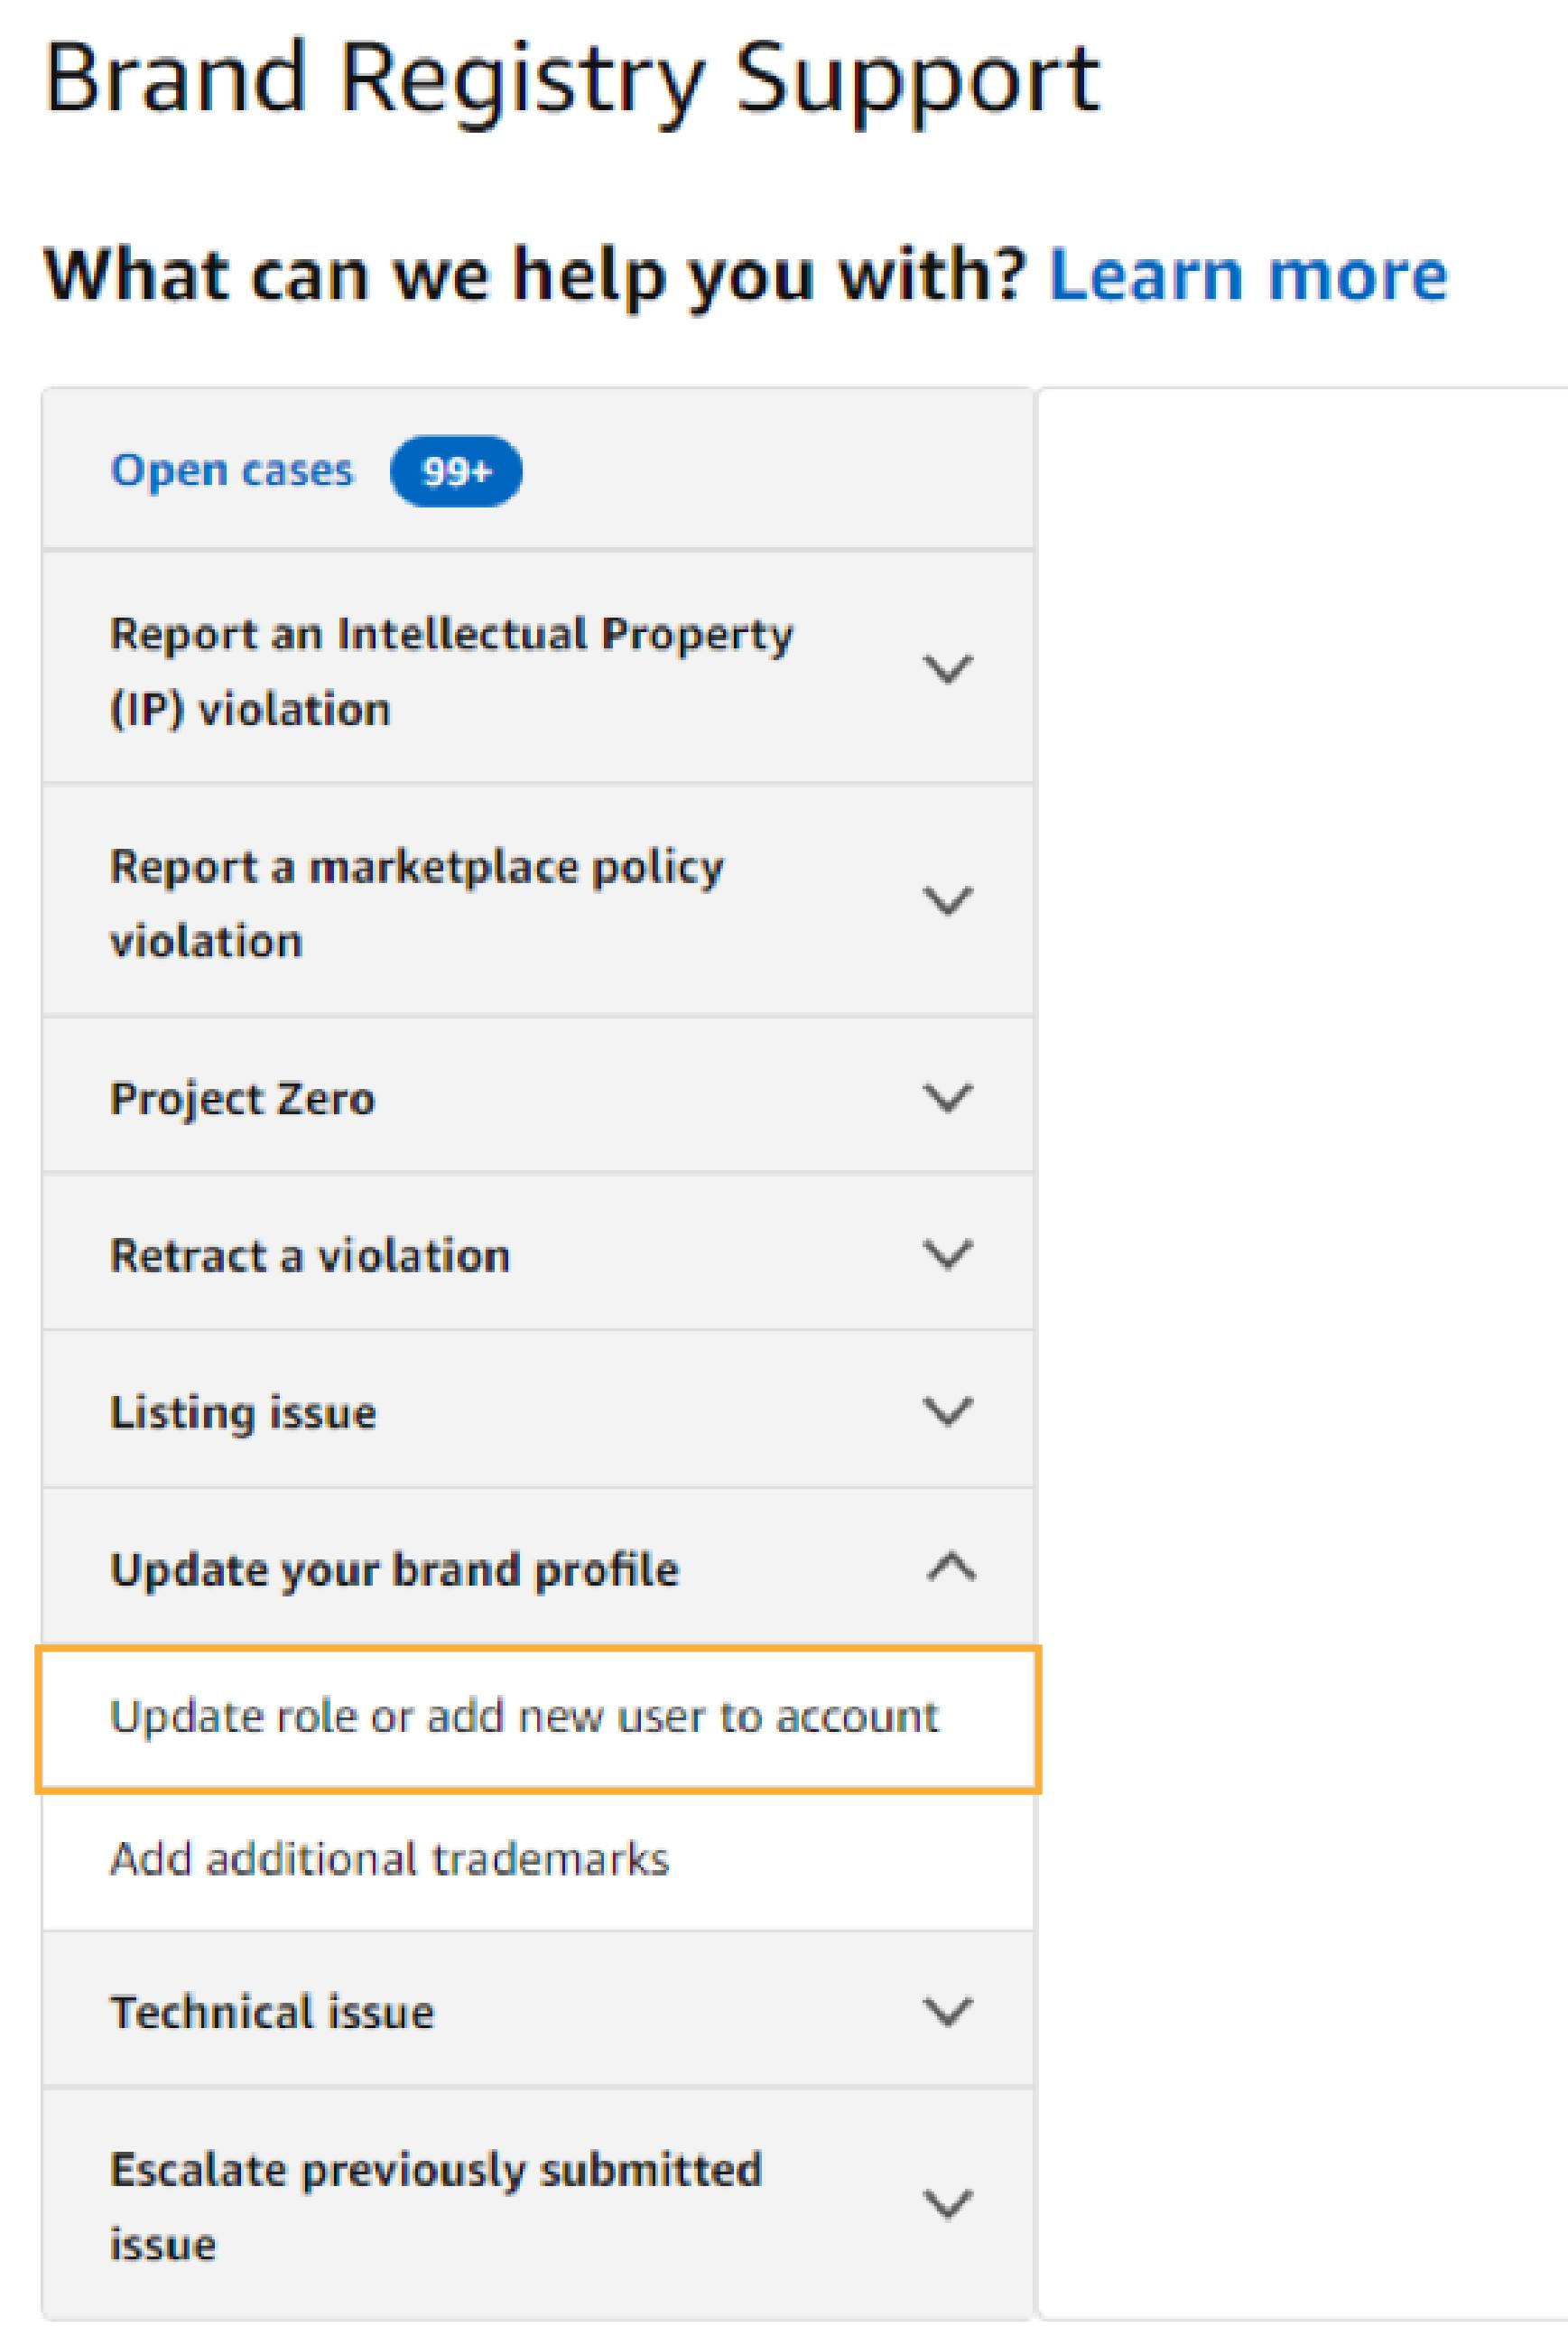 screenshot of Amazon Brand Registry Support